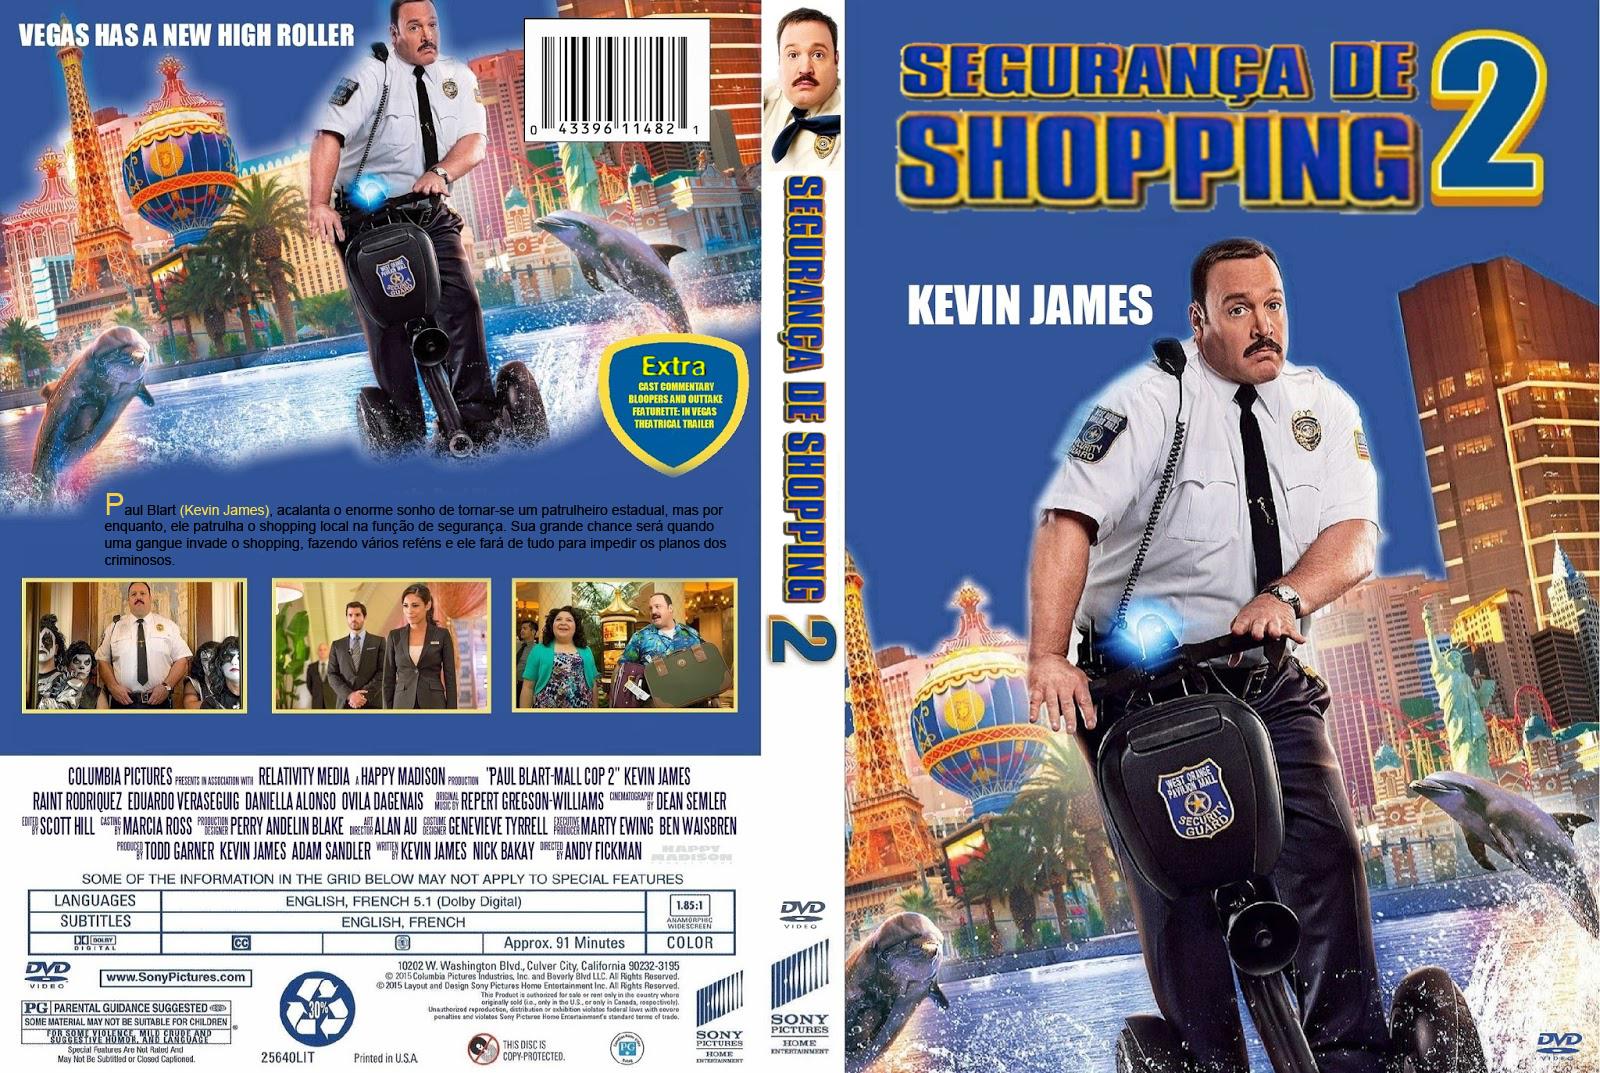 Download Segurança de Shopping 2 BDRip XviD Dual Áudio Seguran 25C3 25A7a 2Bde 2BShopping 2B2